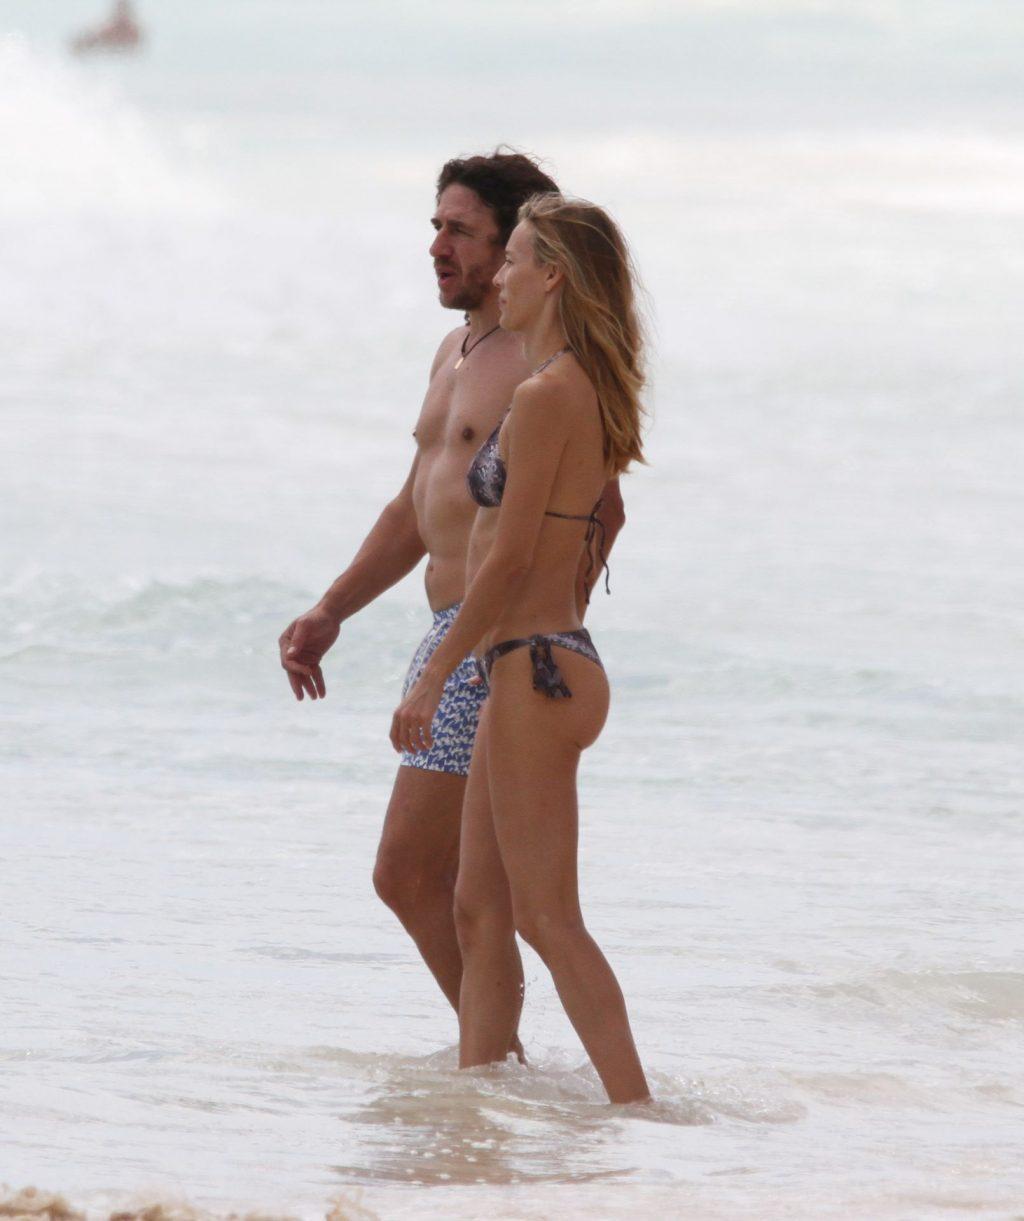 Carles Puyol Enjoy a Family Vacation with Vanesa Lorenzo in Mexico (36 Photos)